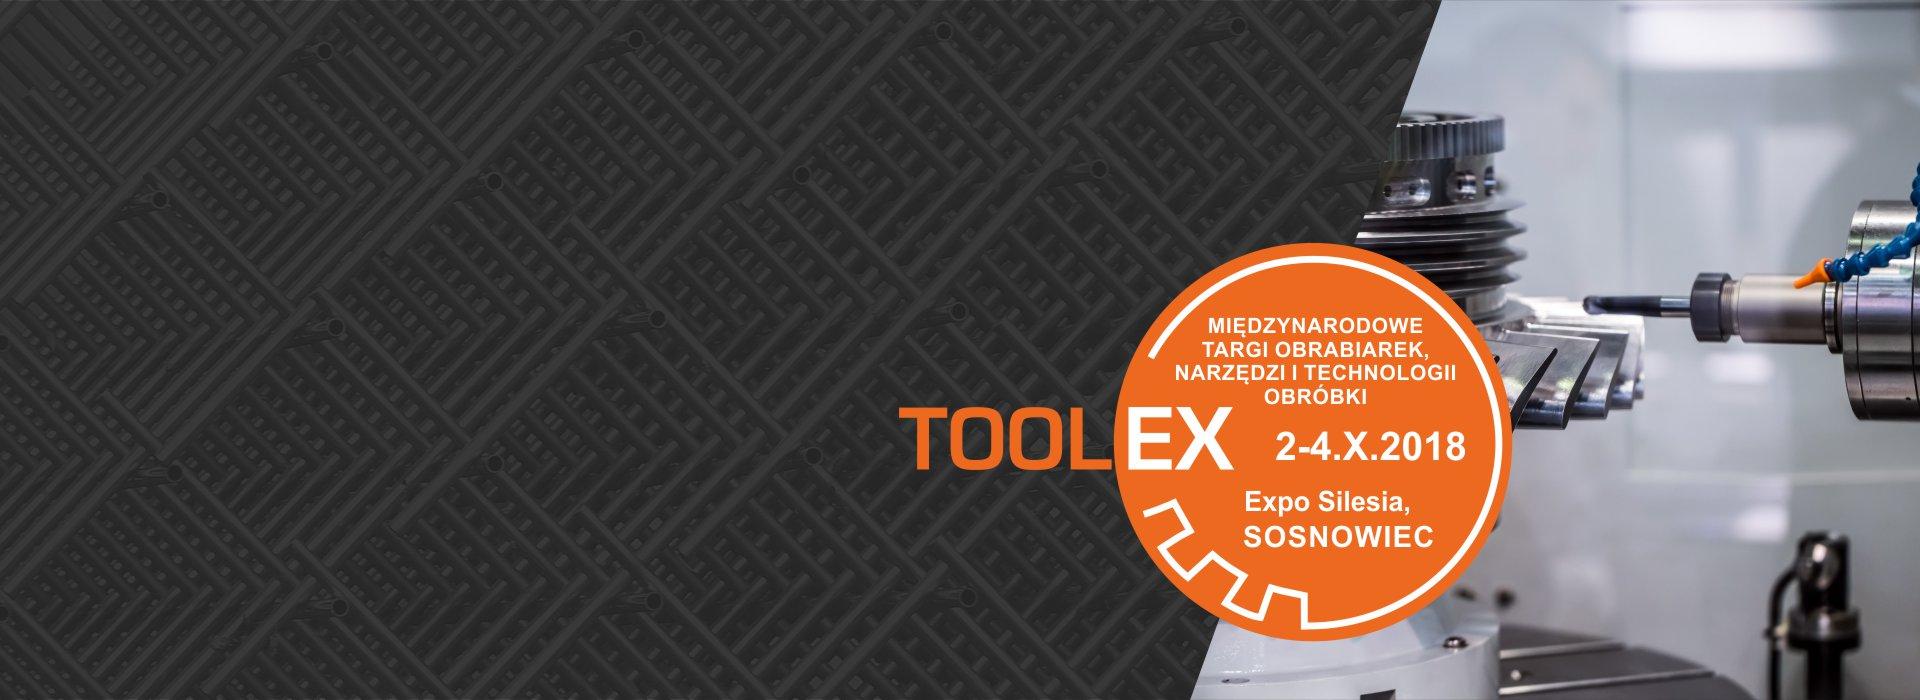 Odwiedź nas na targach TOOLEX – STOISKO A-408